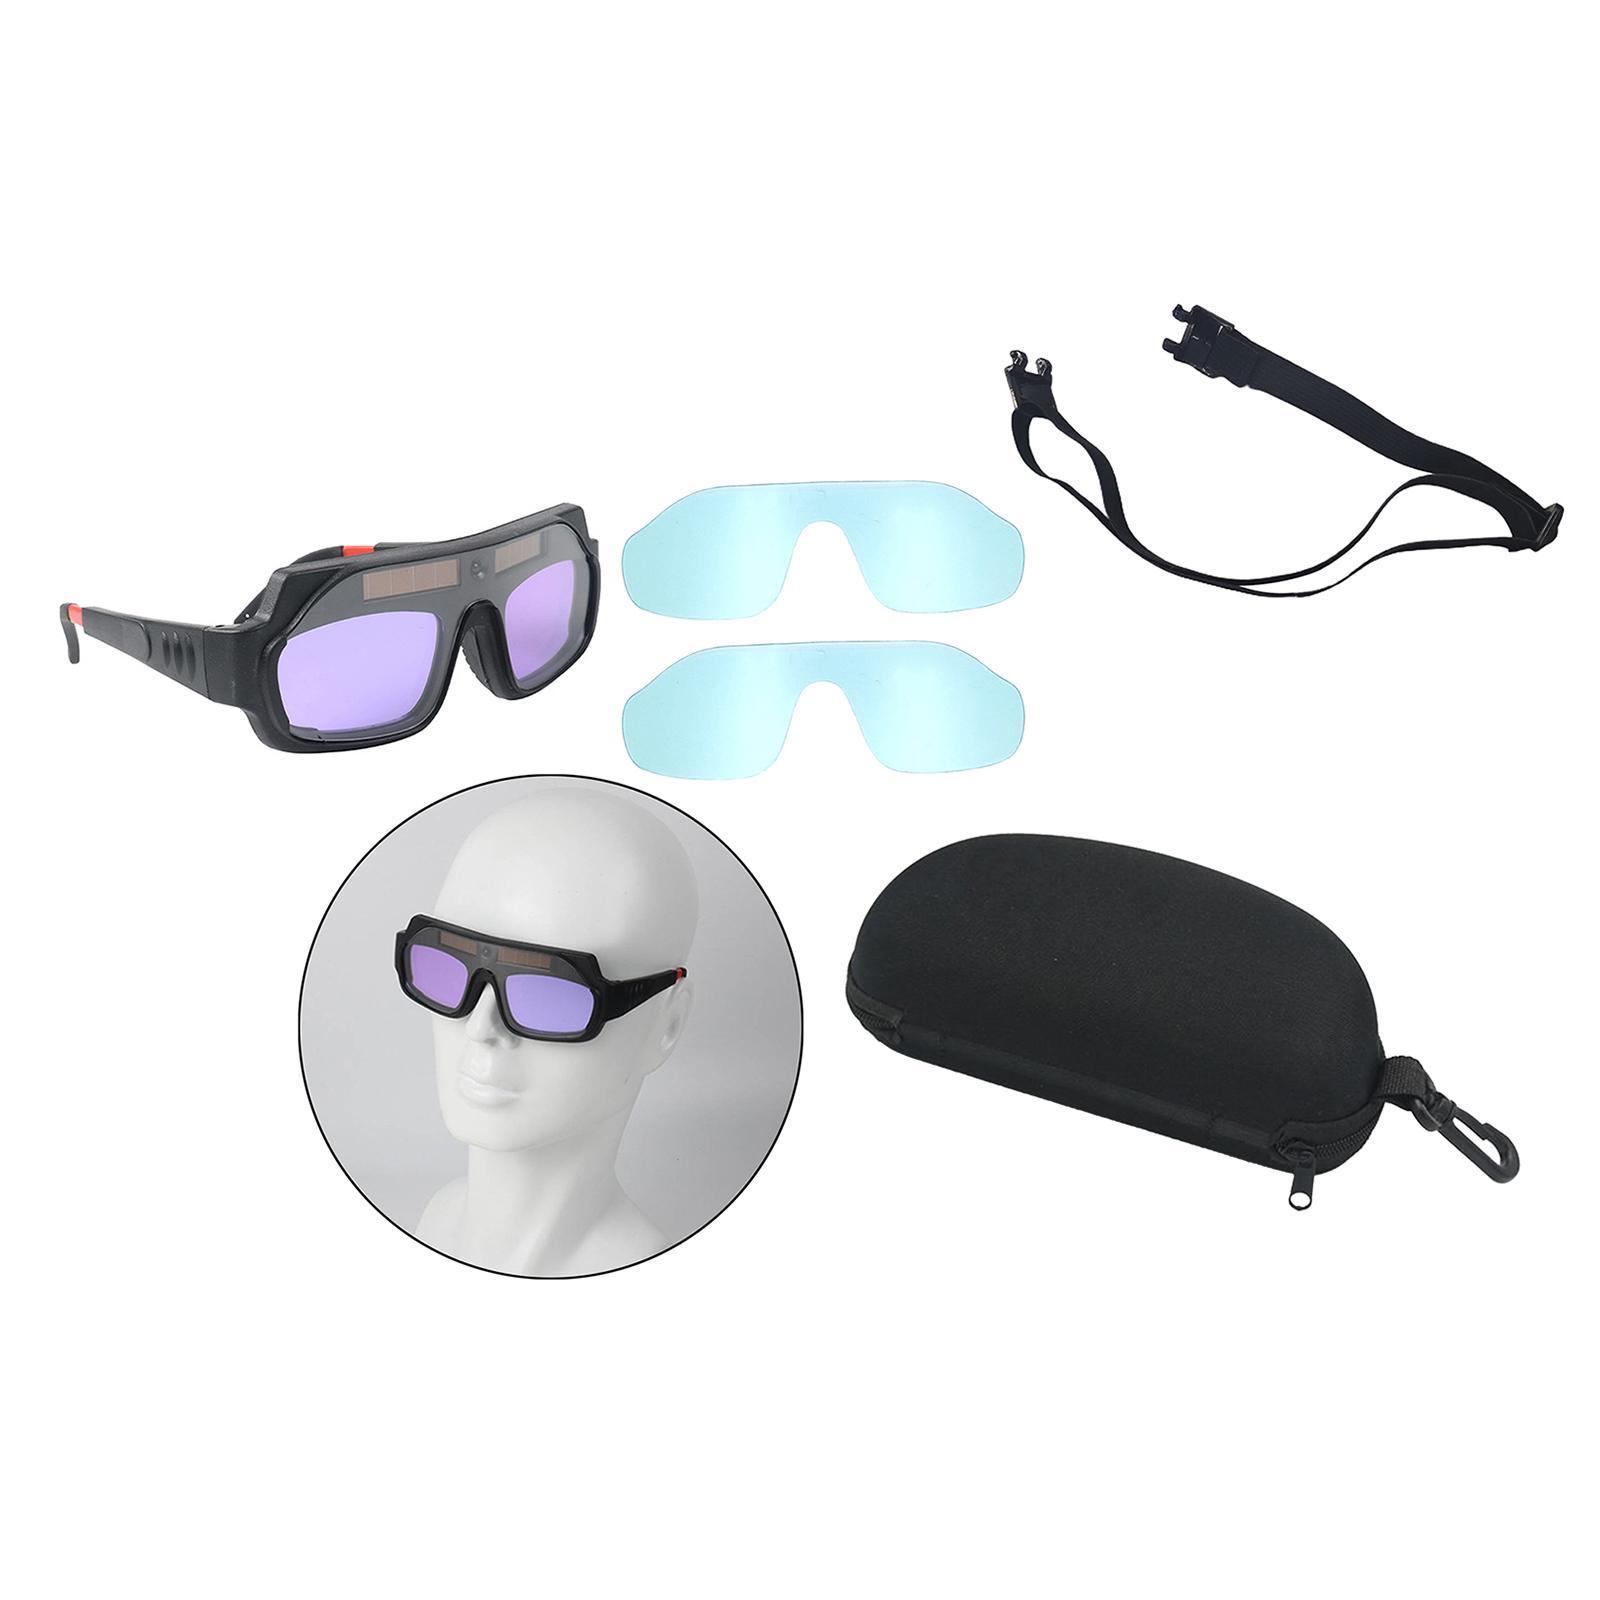 Solar Auto Darkening Welding Mask Welder Goggle Mask for Brazing Cutting Accs